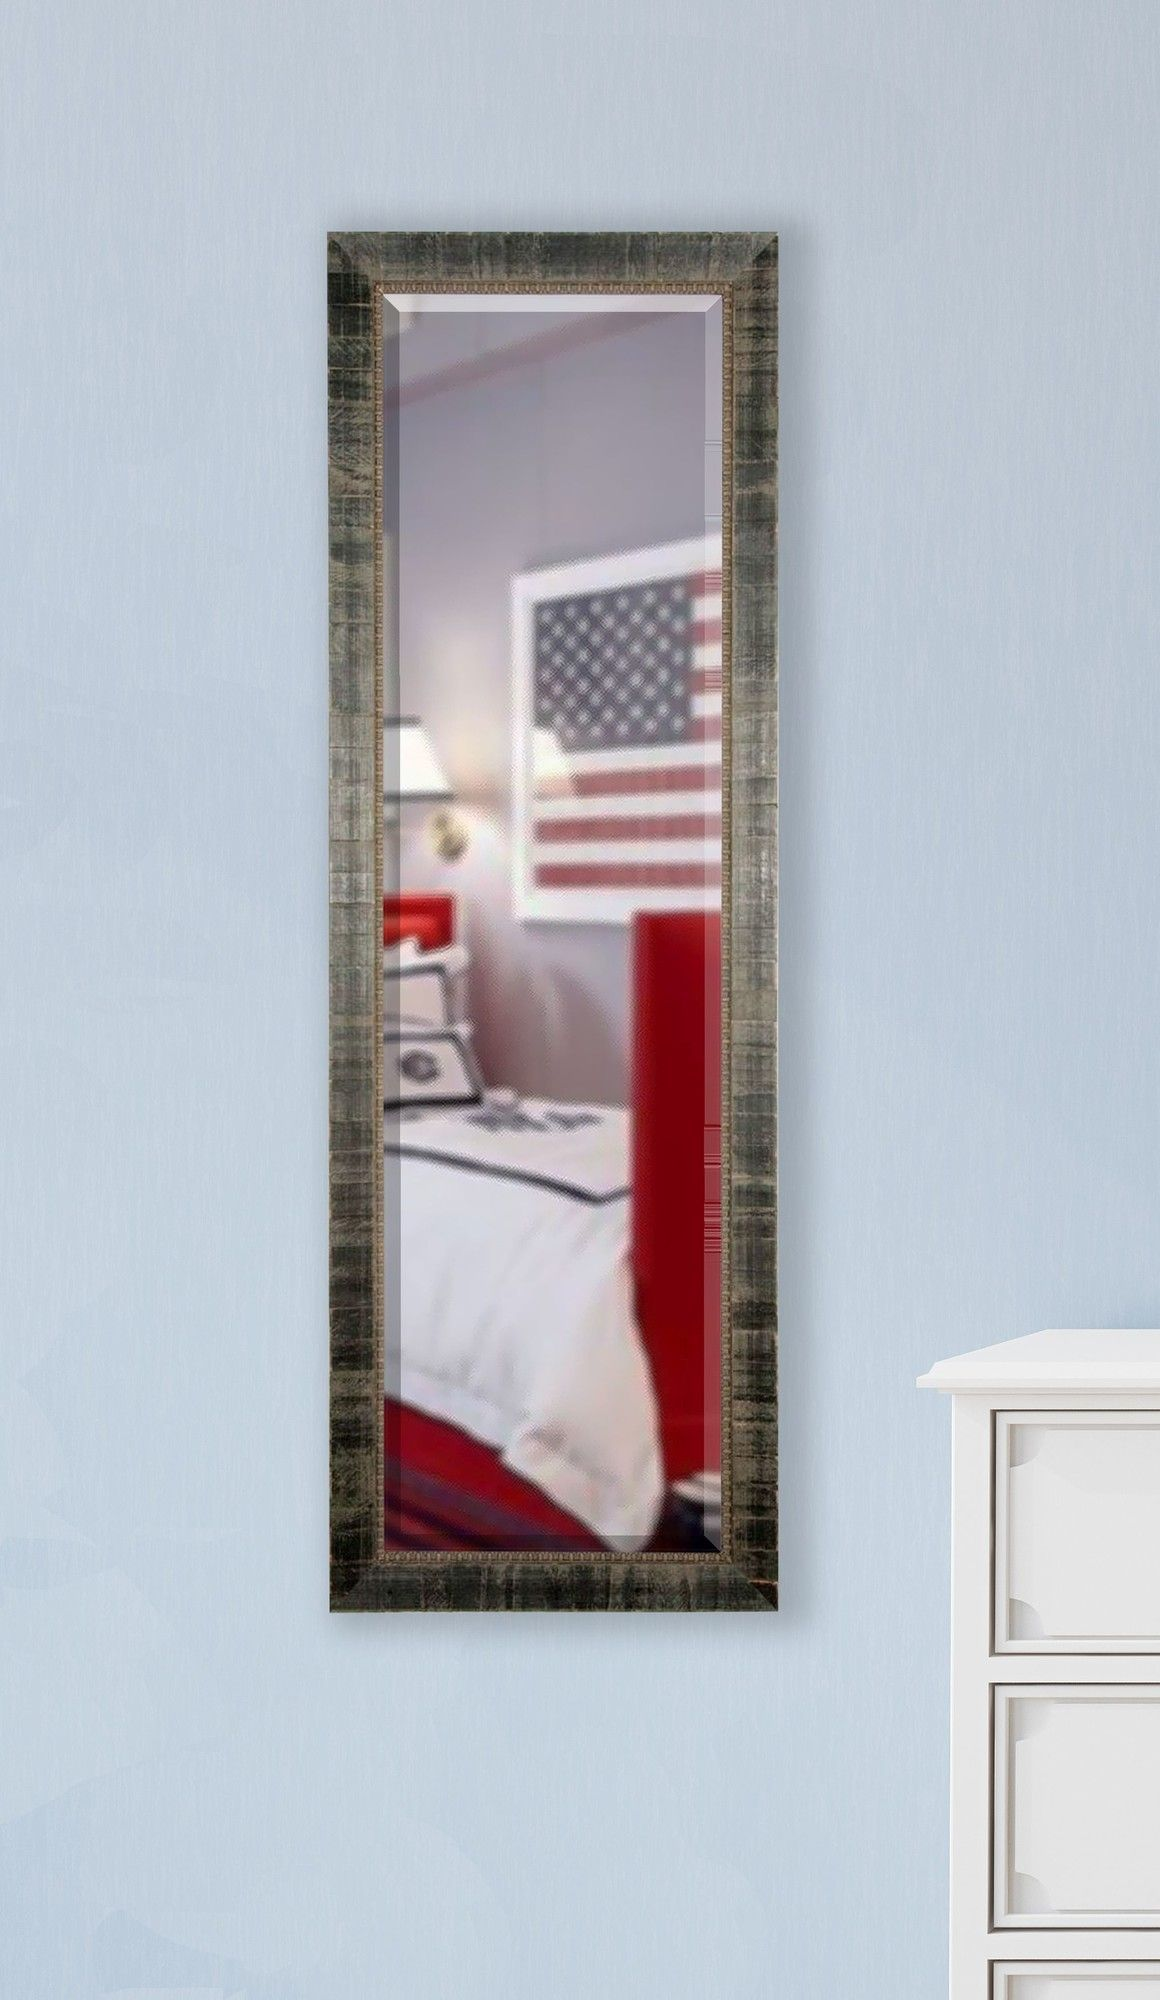 Jovie Jane Tuscan Ebony Full Length Beveled Body Mirror